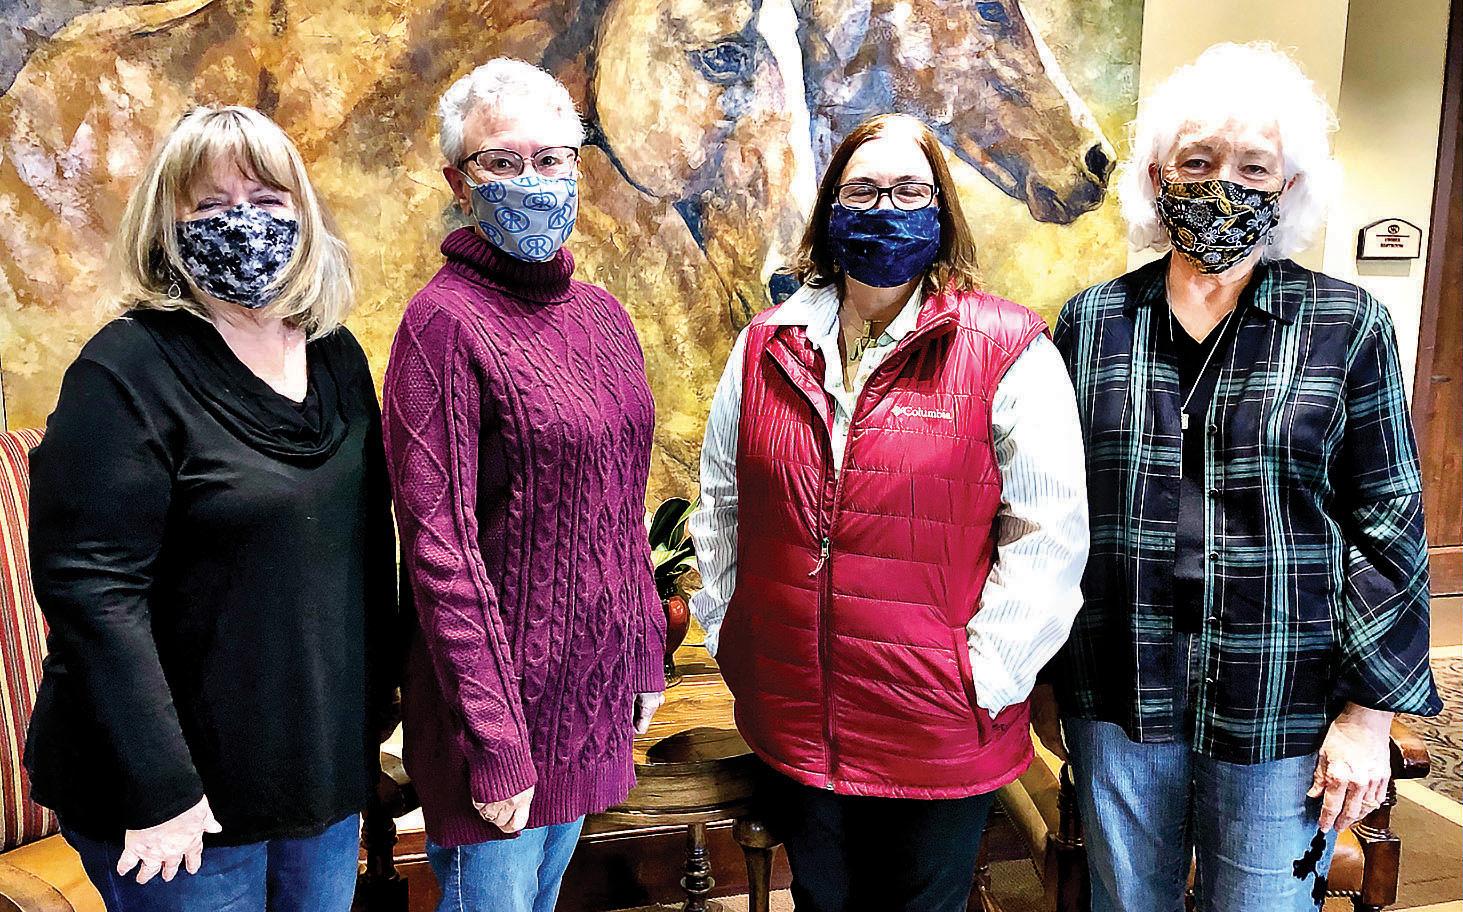 Deb Williams, Sandra Waggoner, Megan Wiegand, and Paula Saunders